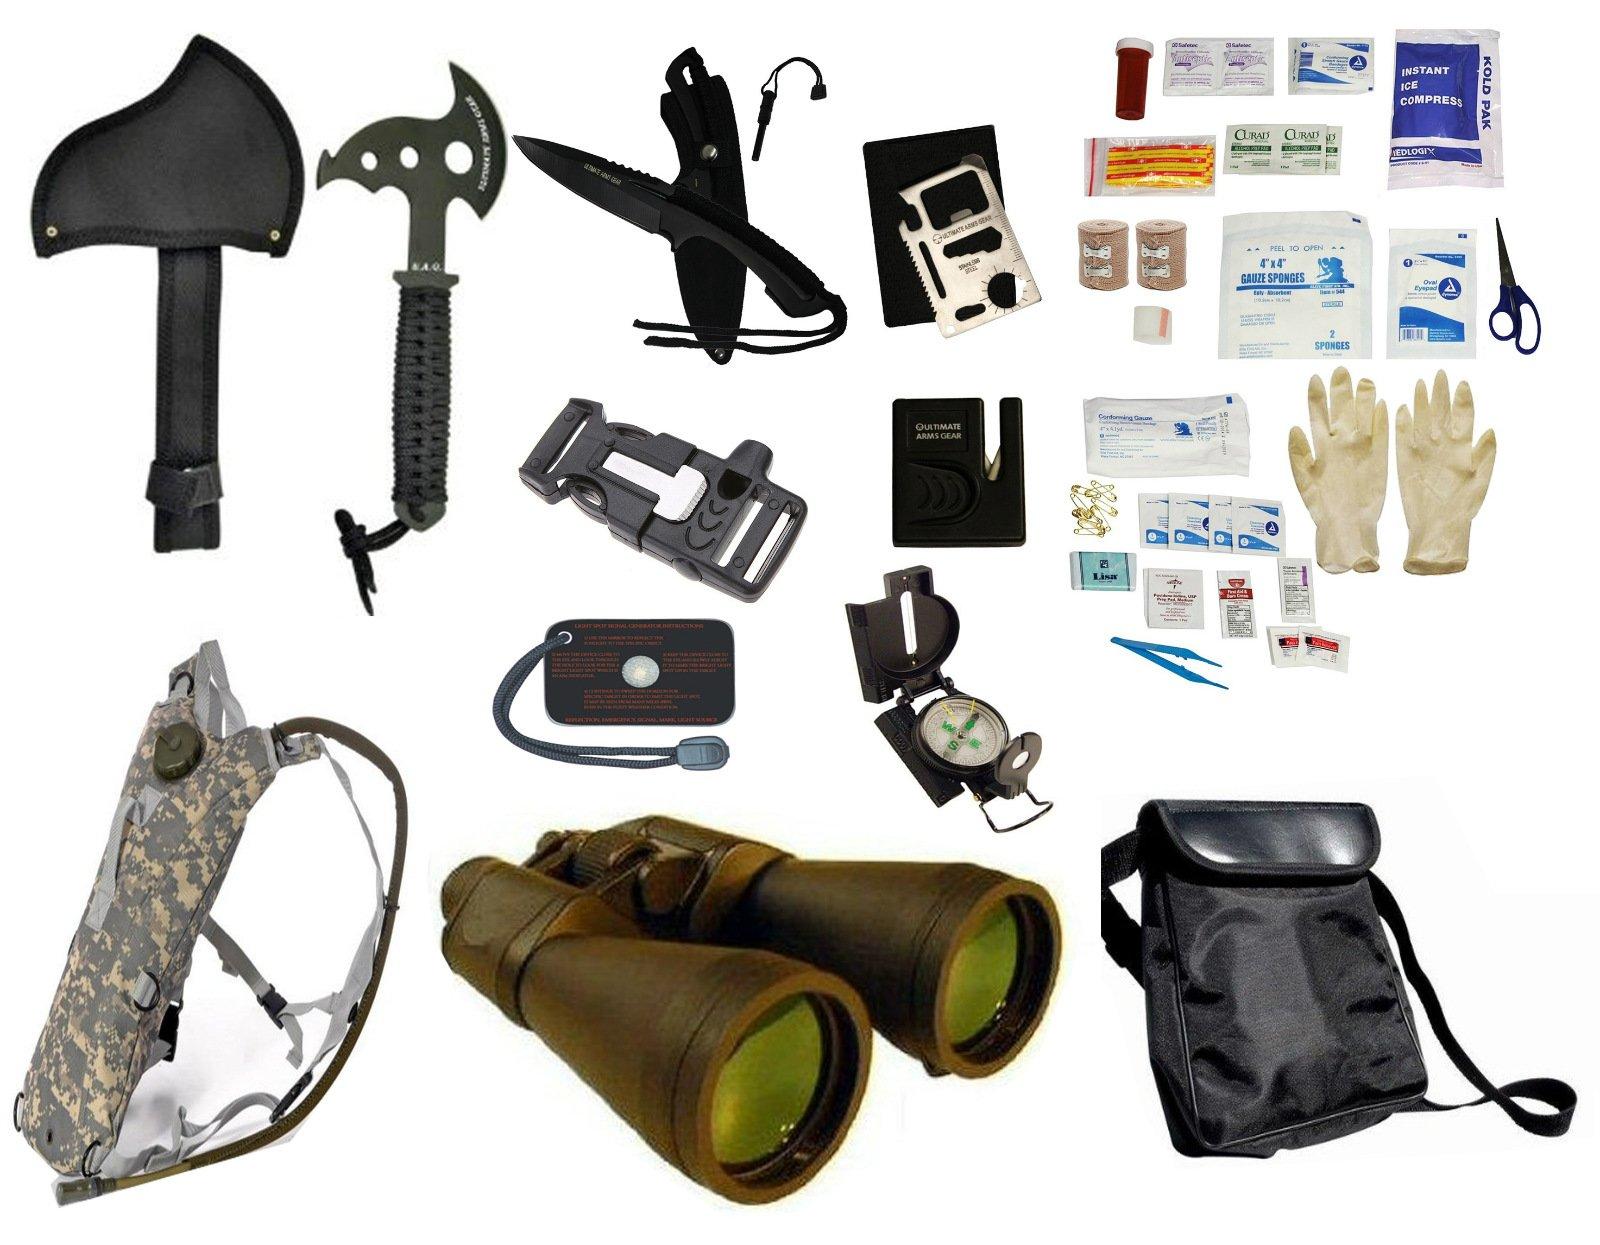 Survival Camping Hiking Kit: Emergency First Aid, 20X70 Binoculars Green,Sharpener, Axe, Fire Blade, Whistle Flint Striker Belt Buckle, ACU Hydration Backpack, Multi Tool, Compass, Signal Mirror